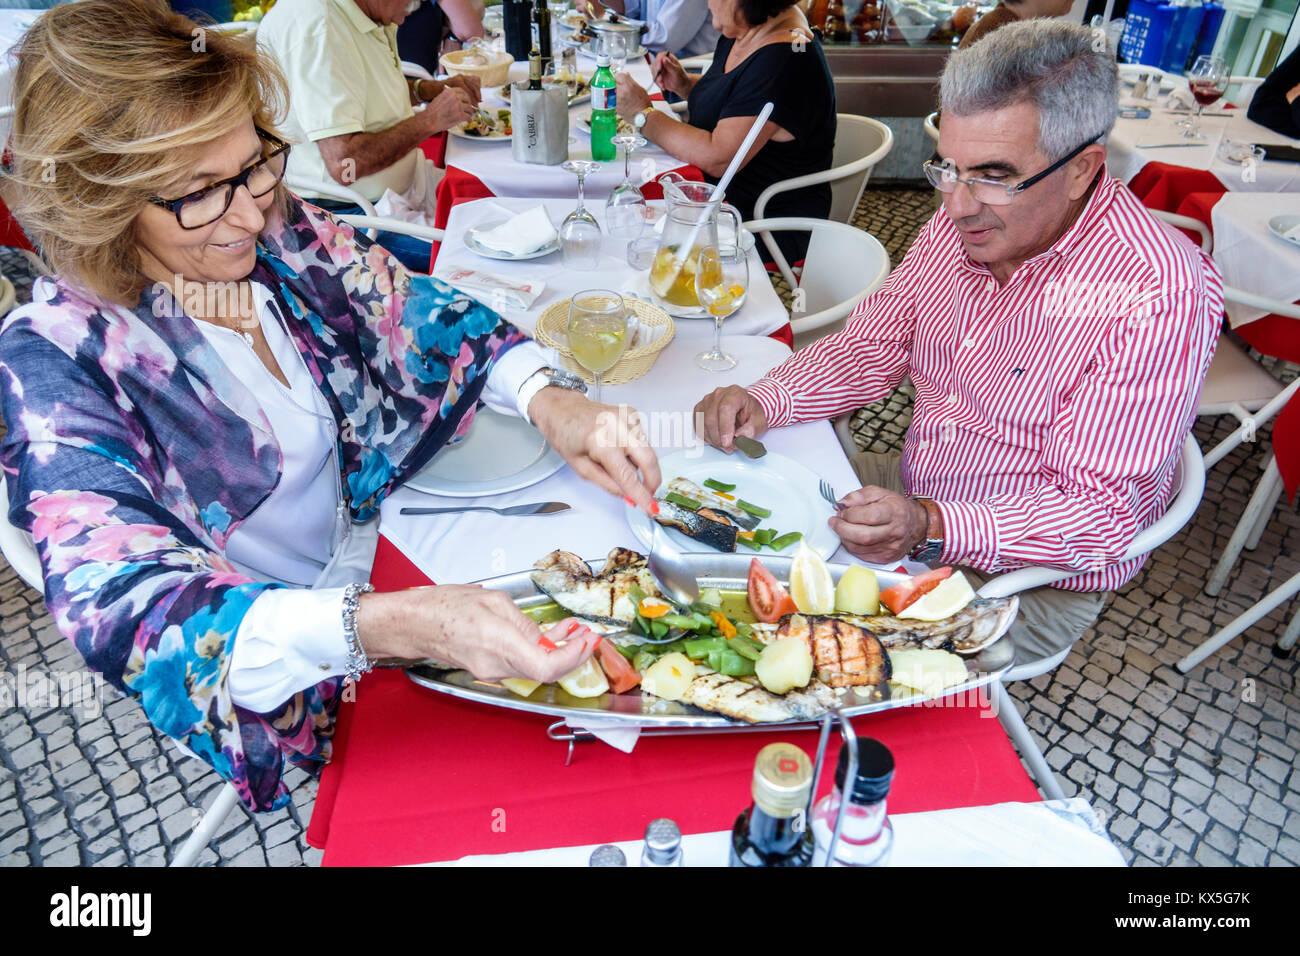 Lisbon Portugal Rossio historic center Restaurante Prazeres do Mar restaurant dining Marisqueira seafood plate tray - Stock Image